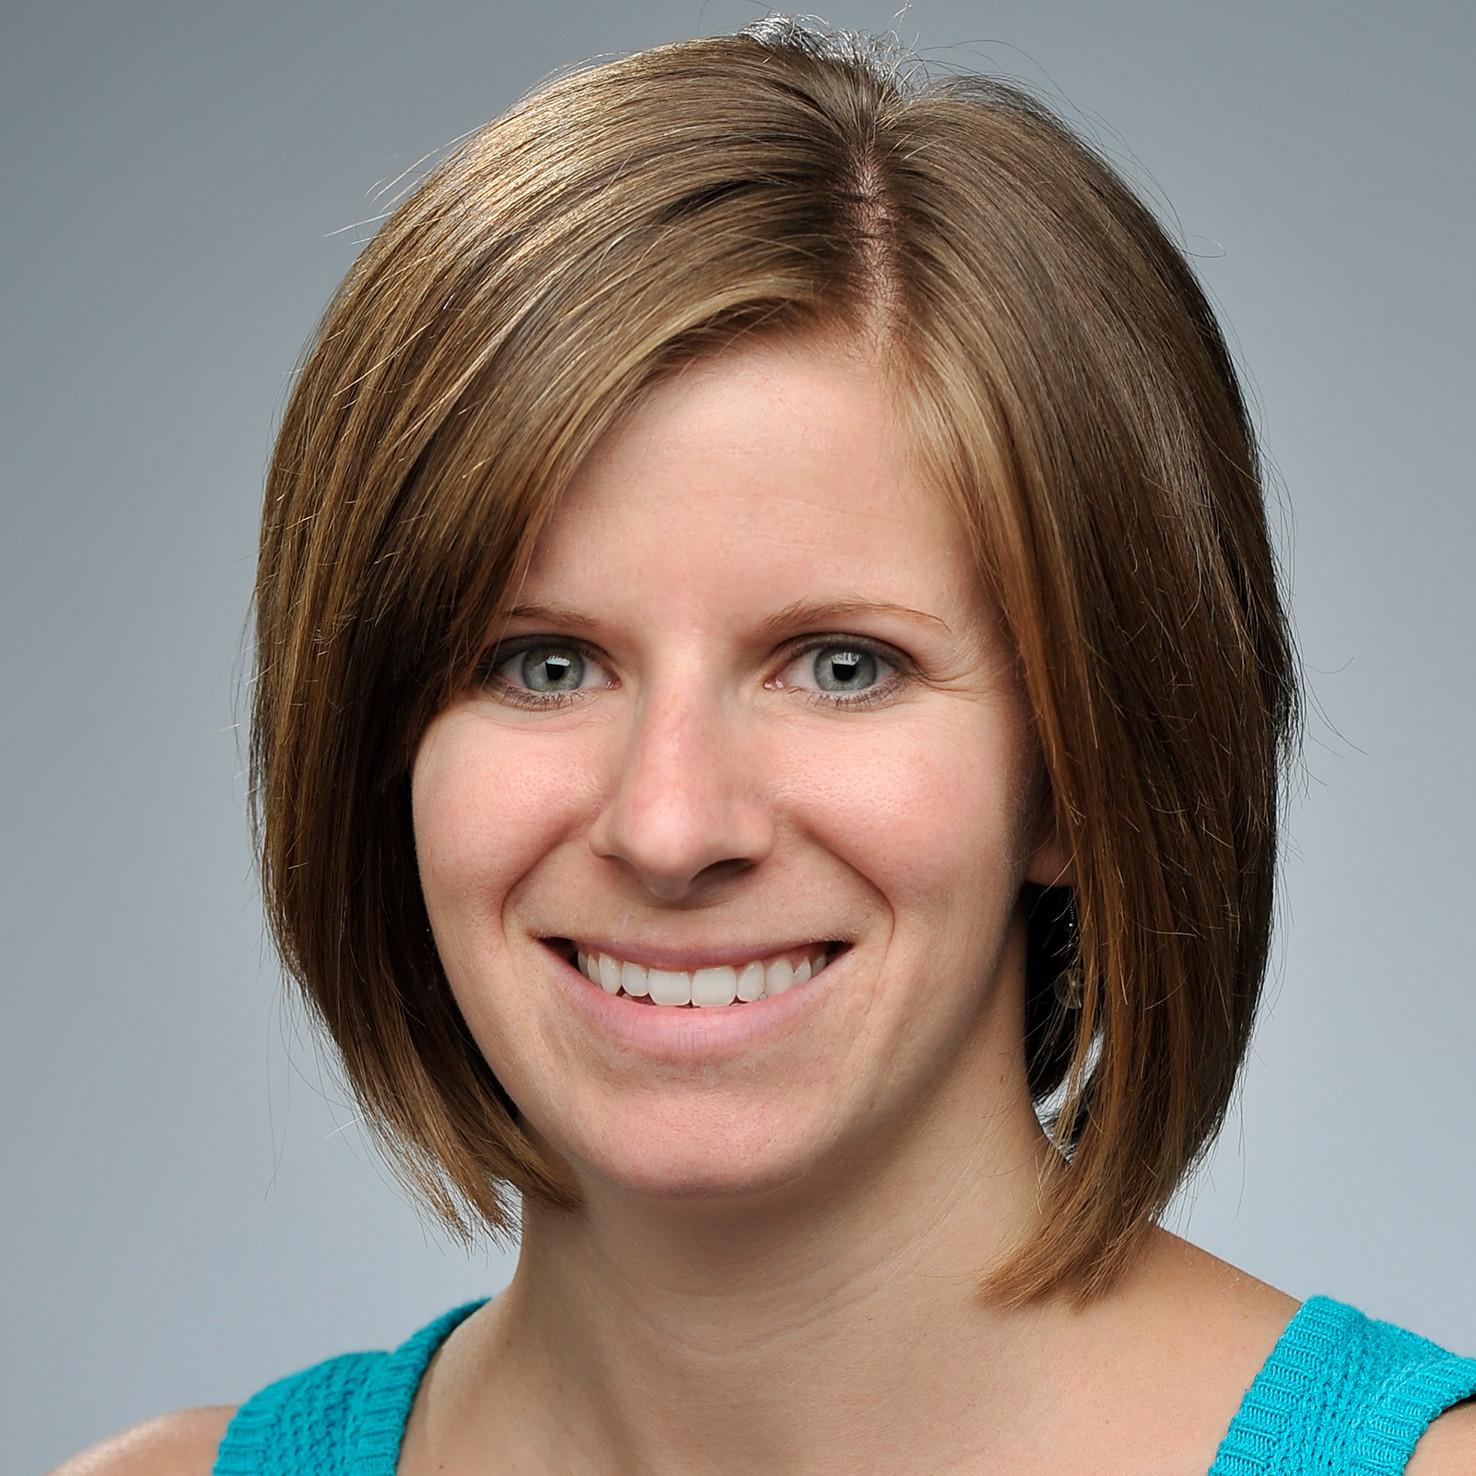 Megan Ballweber